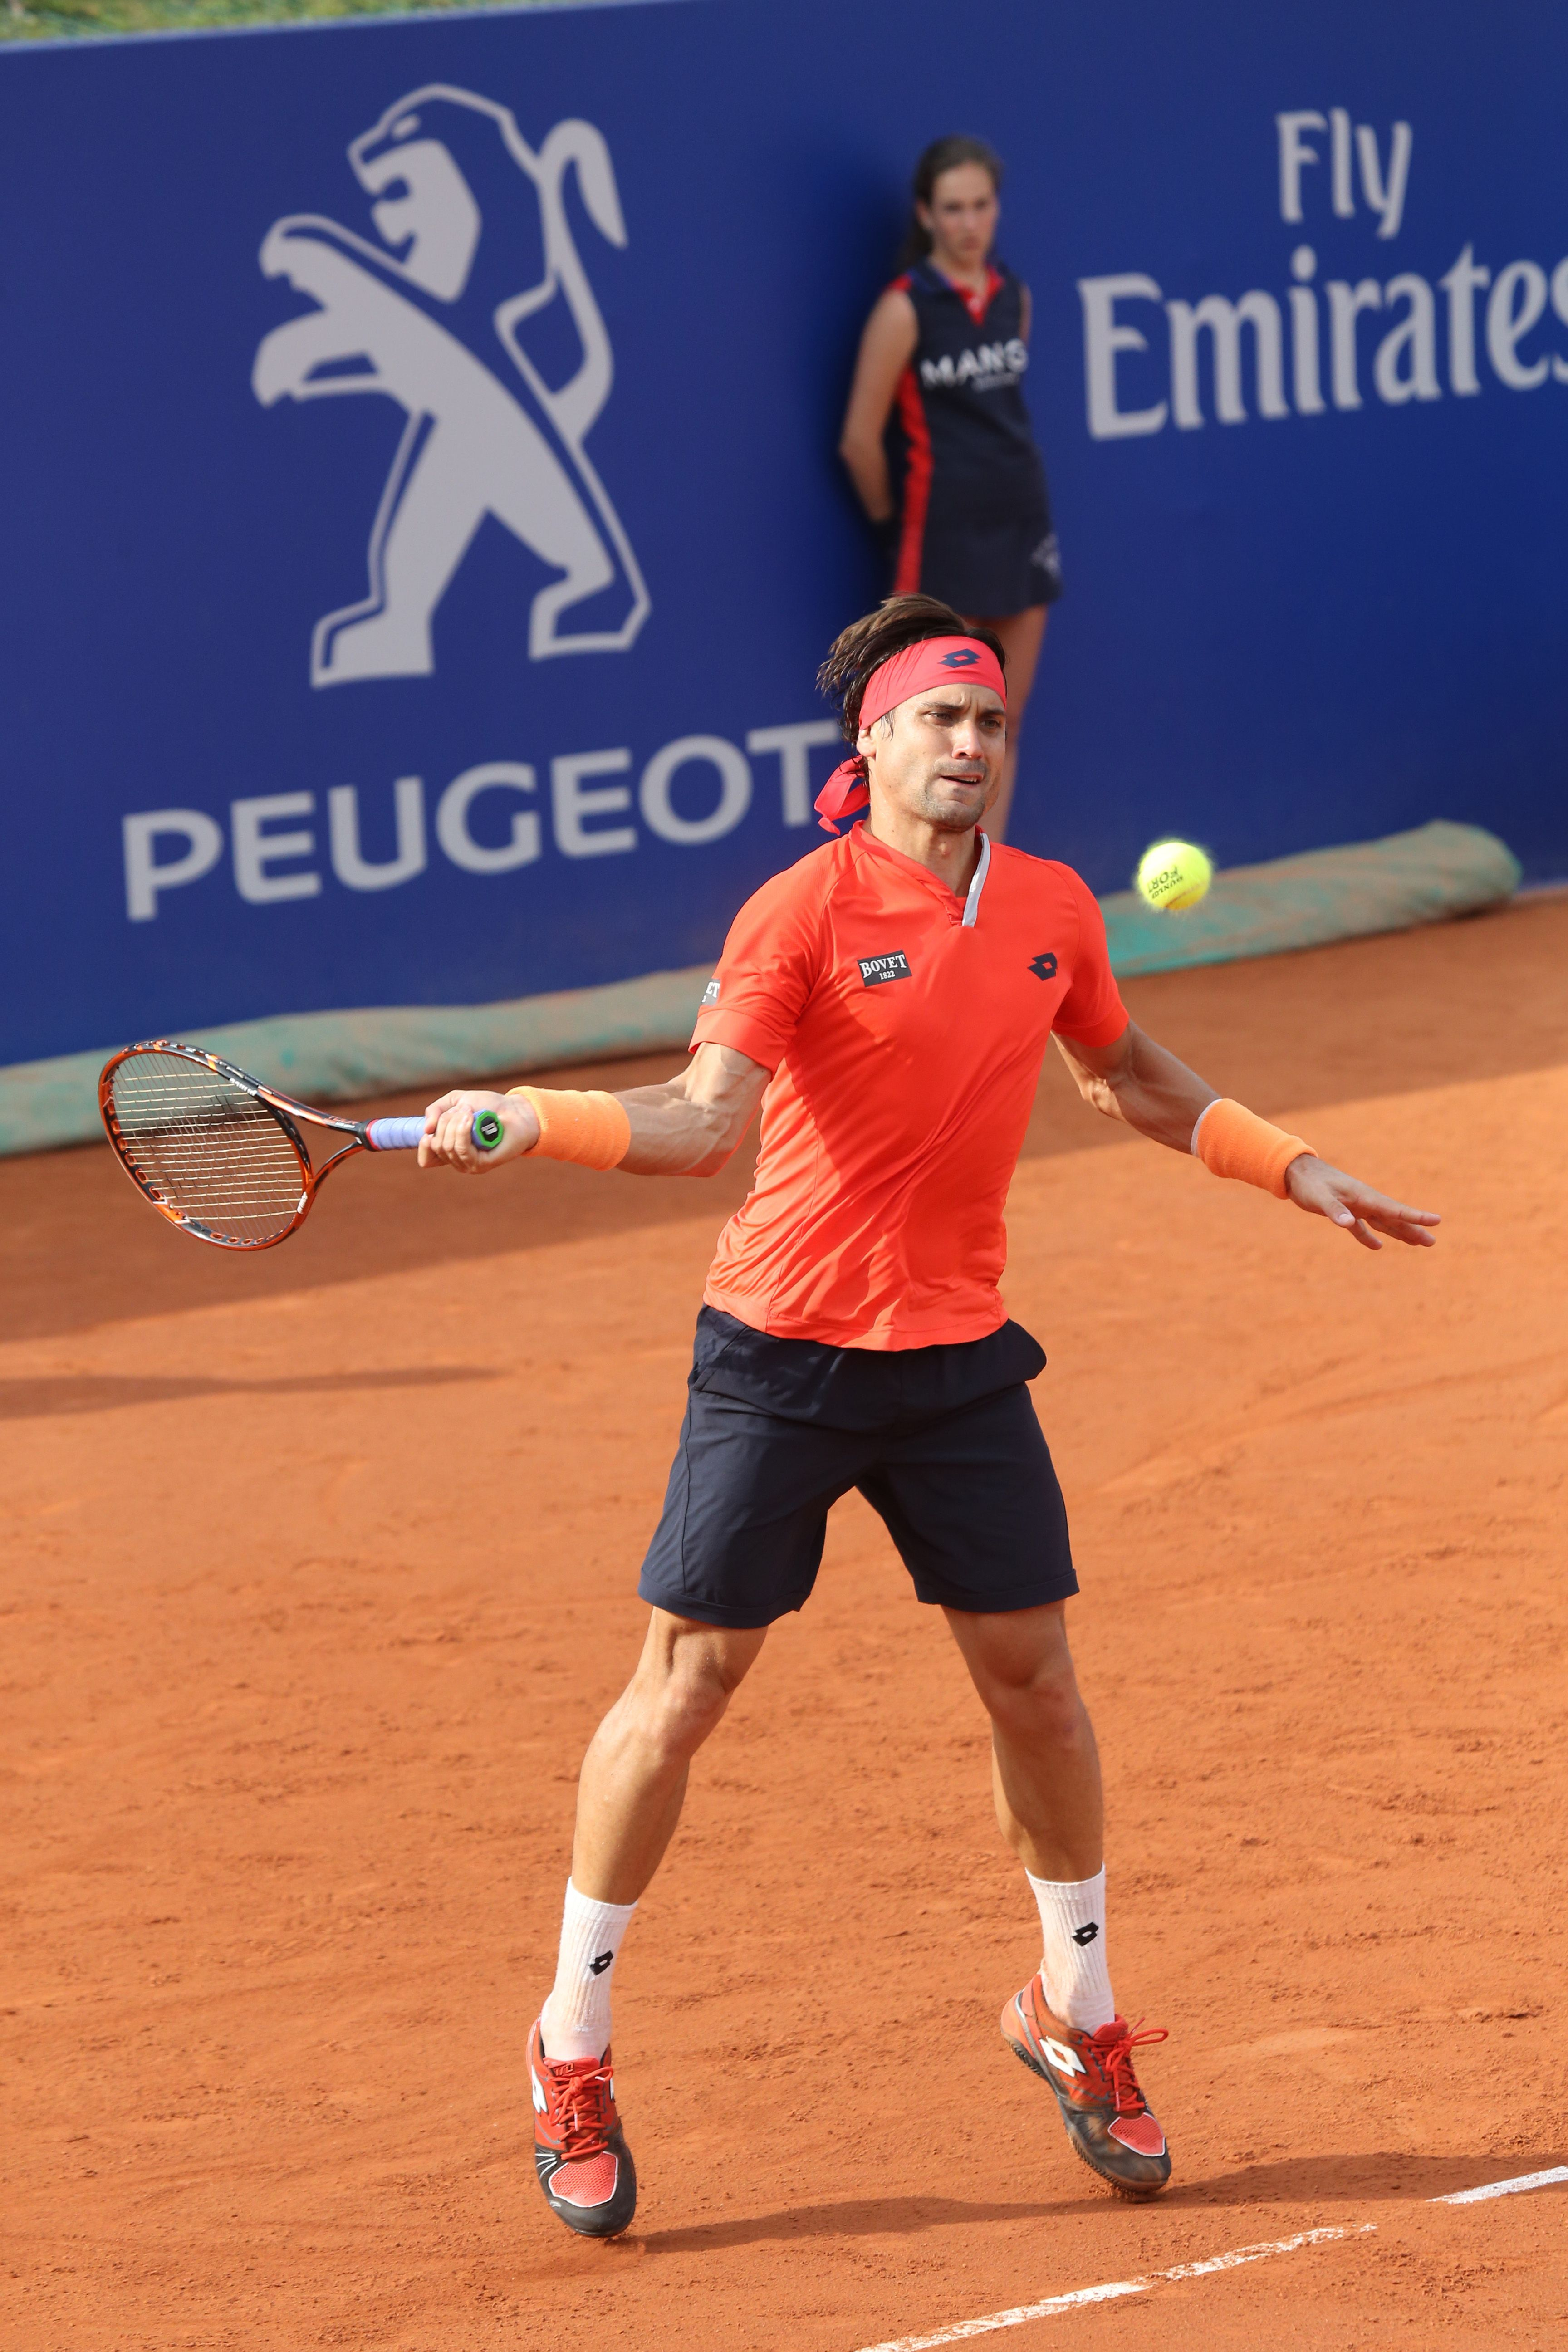 David Ferrer with Tennis by Peugeot #Tennis #Peugeot #Ambassador